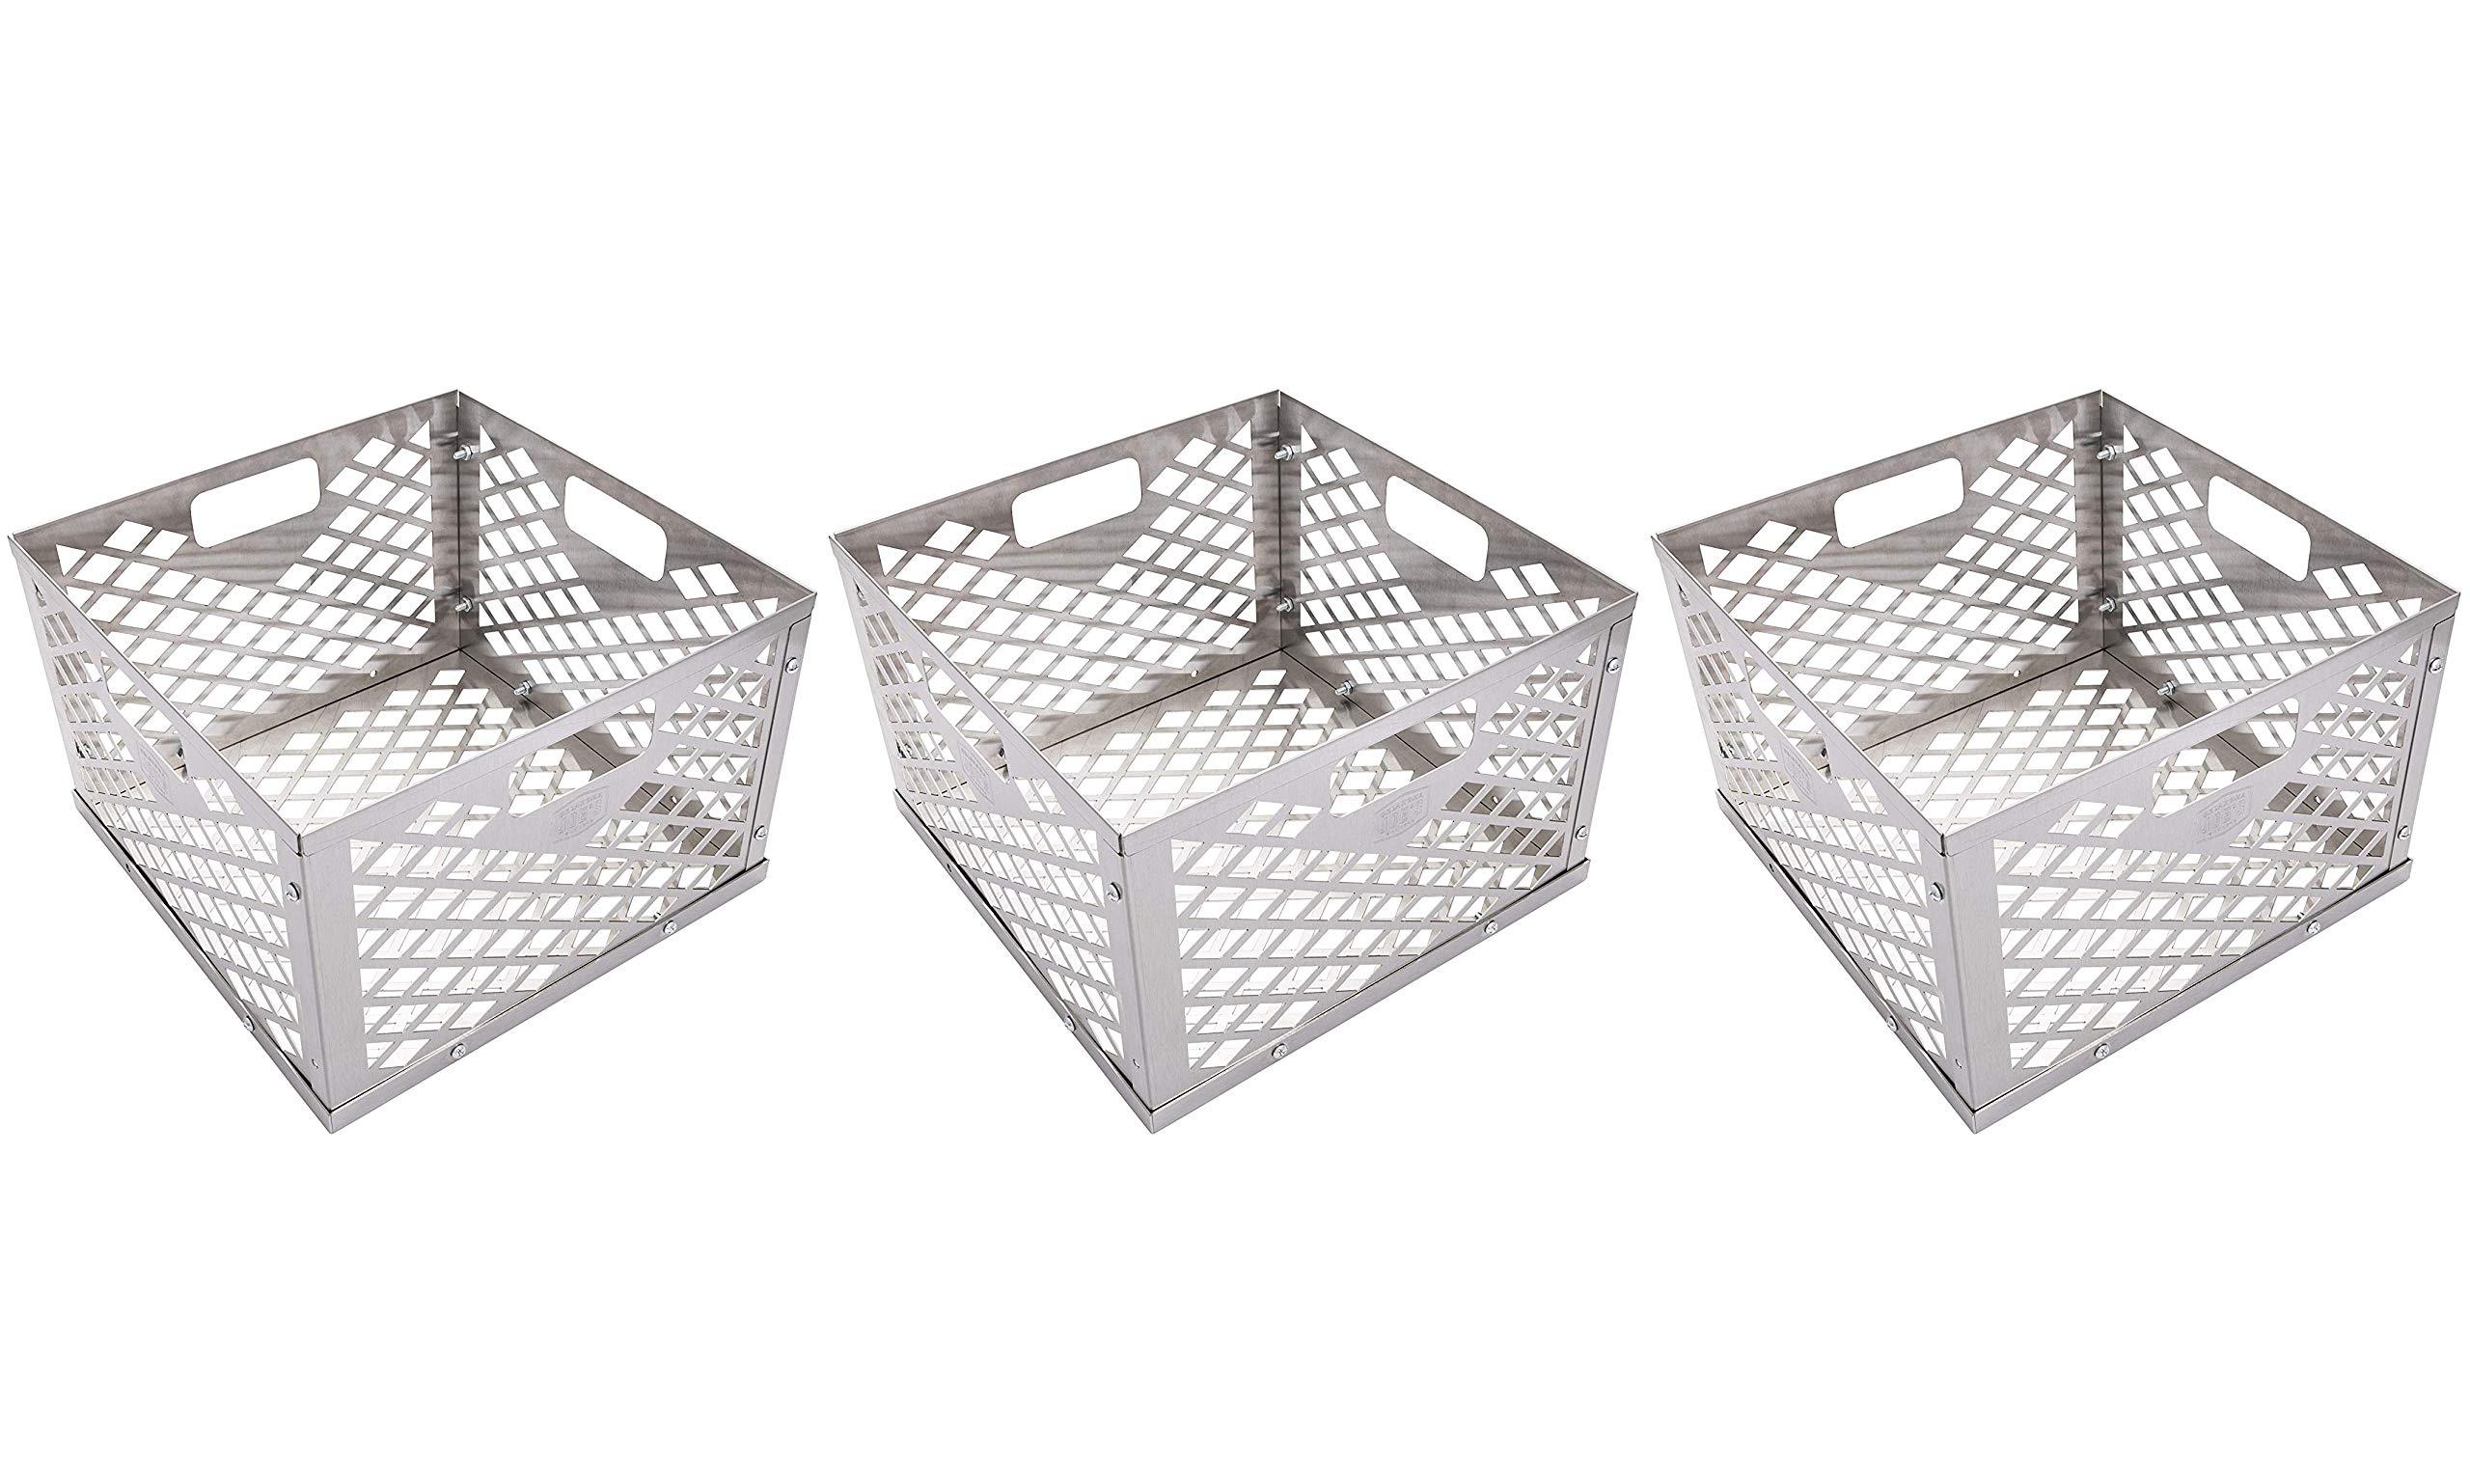 Oklahoma Joe's 5279338P04 Firebox Basket, Silver (Тhrее Pаck)